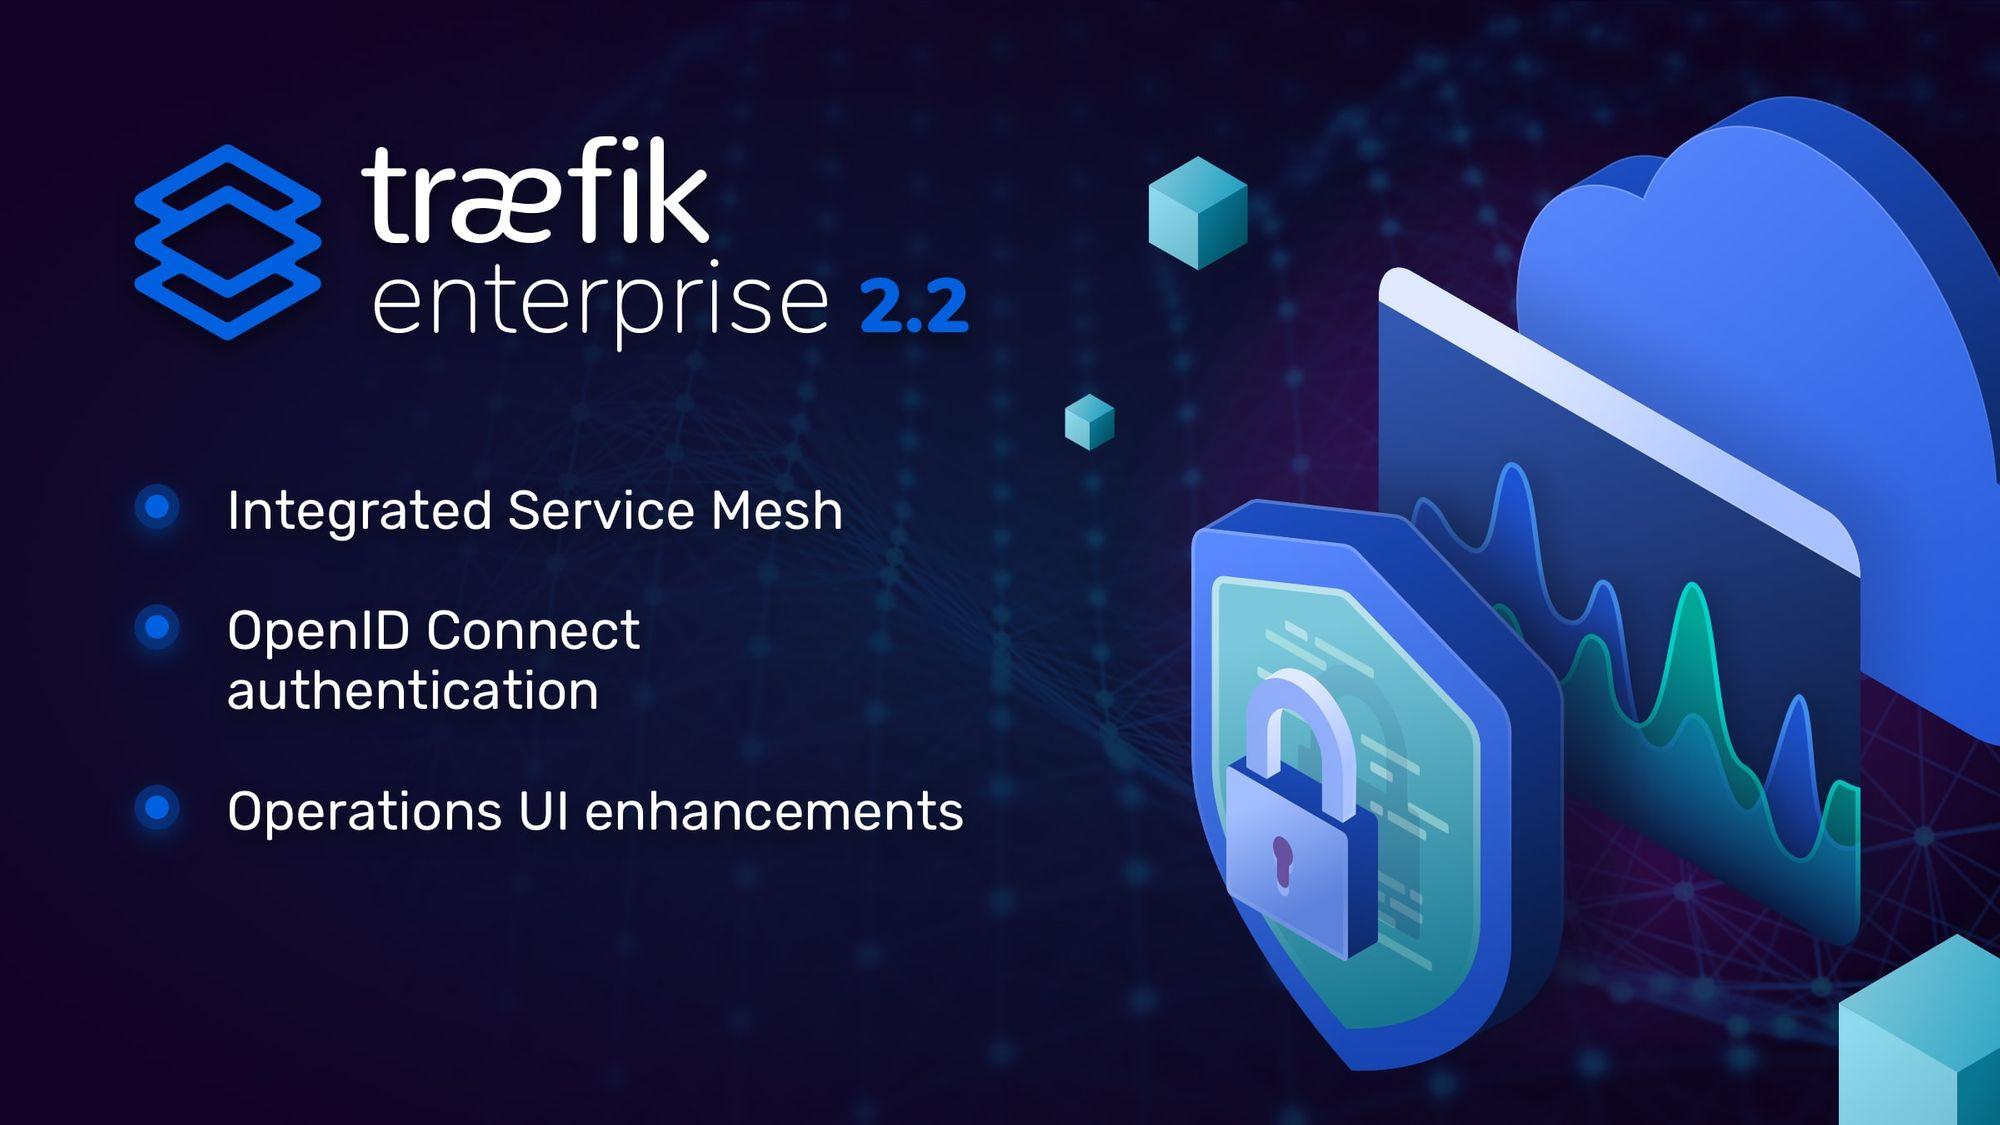 Announcing Traefik Enterprise 2.2